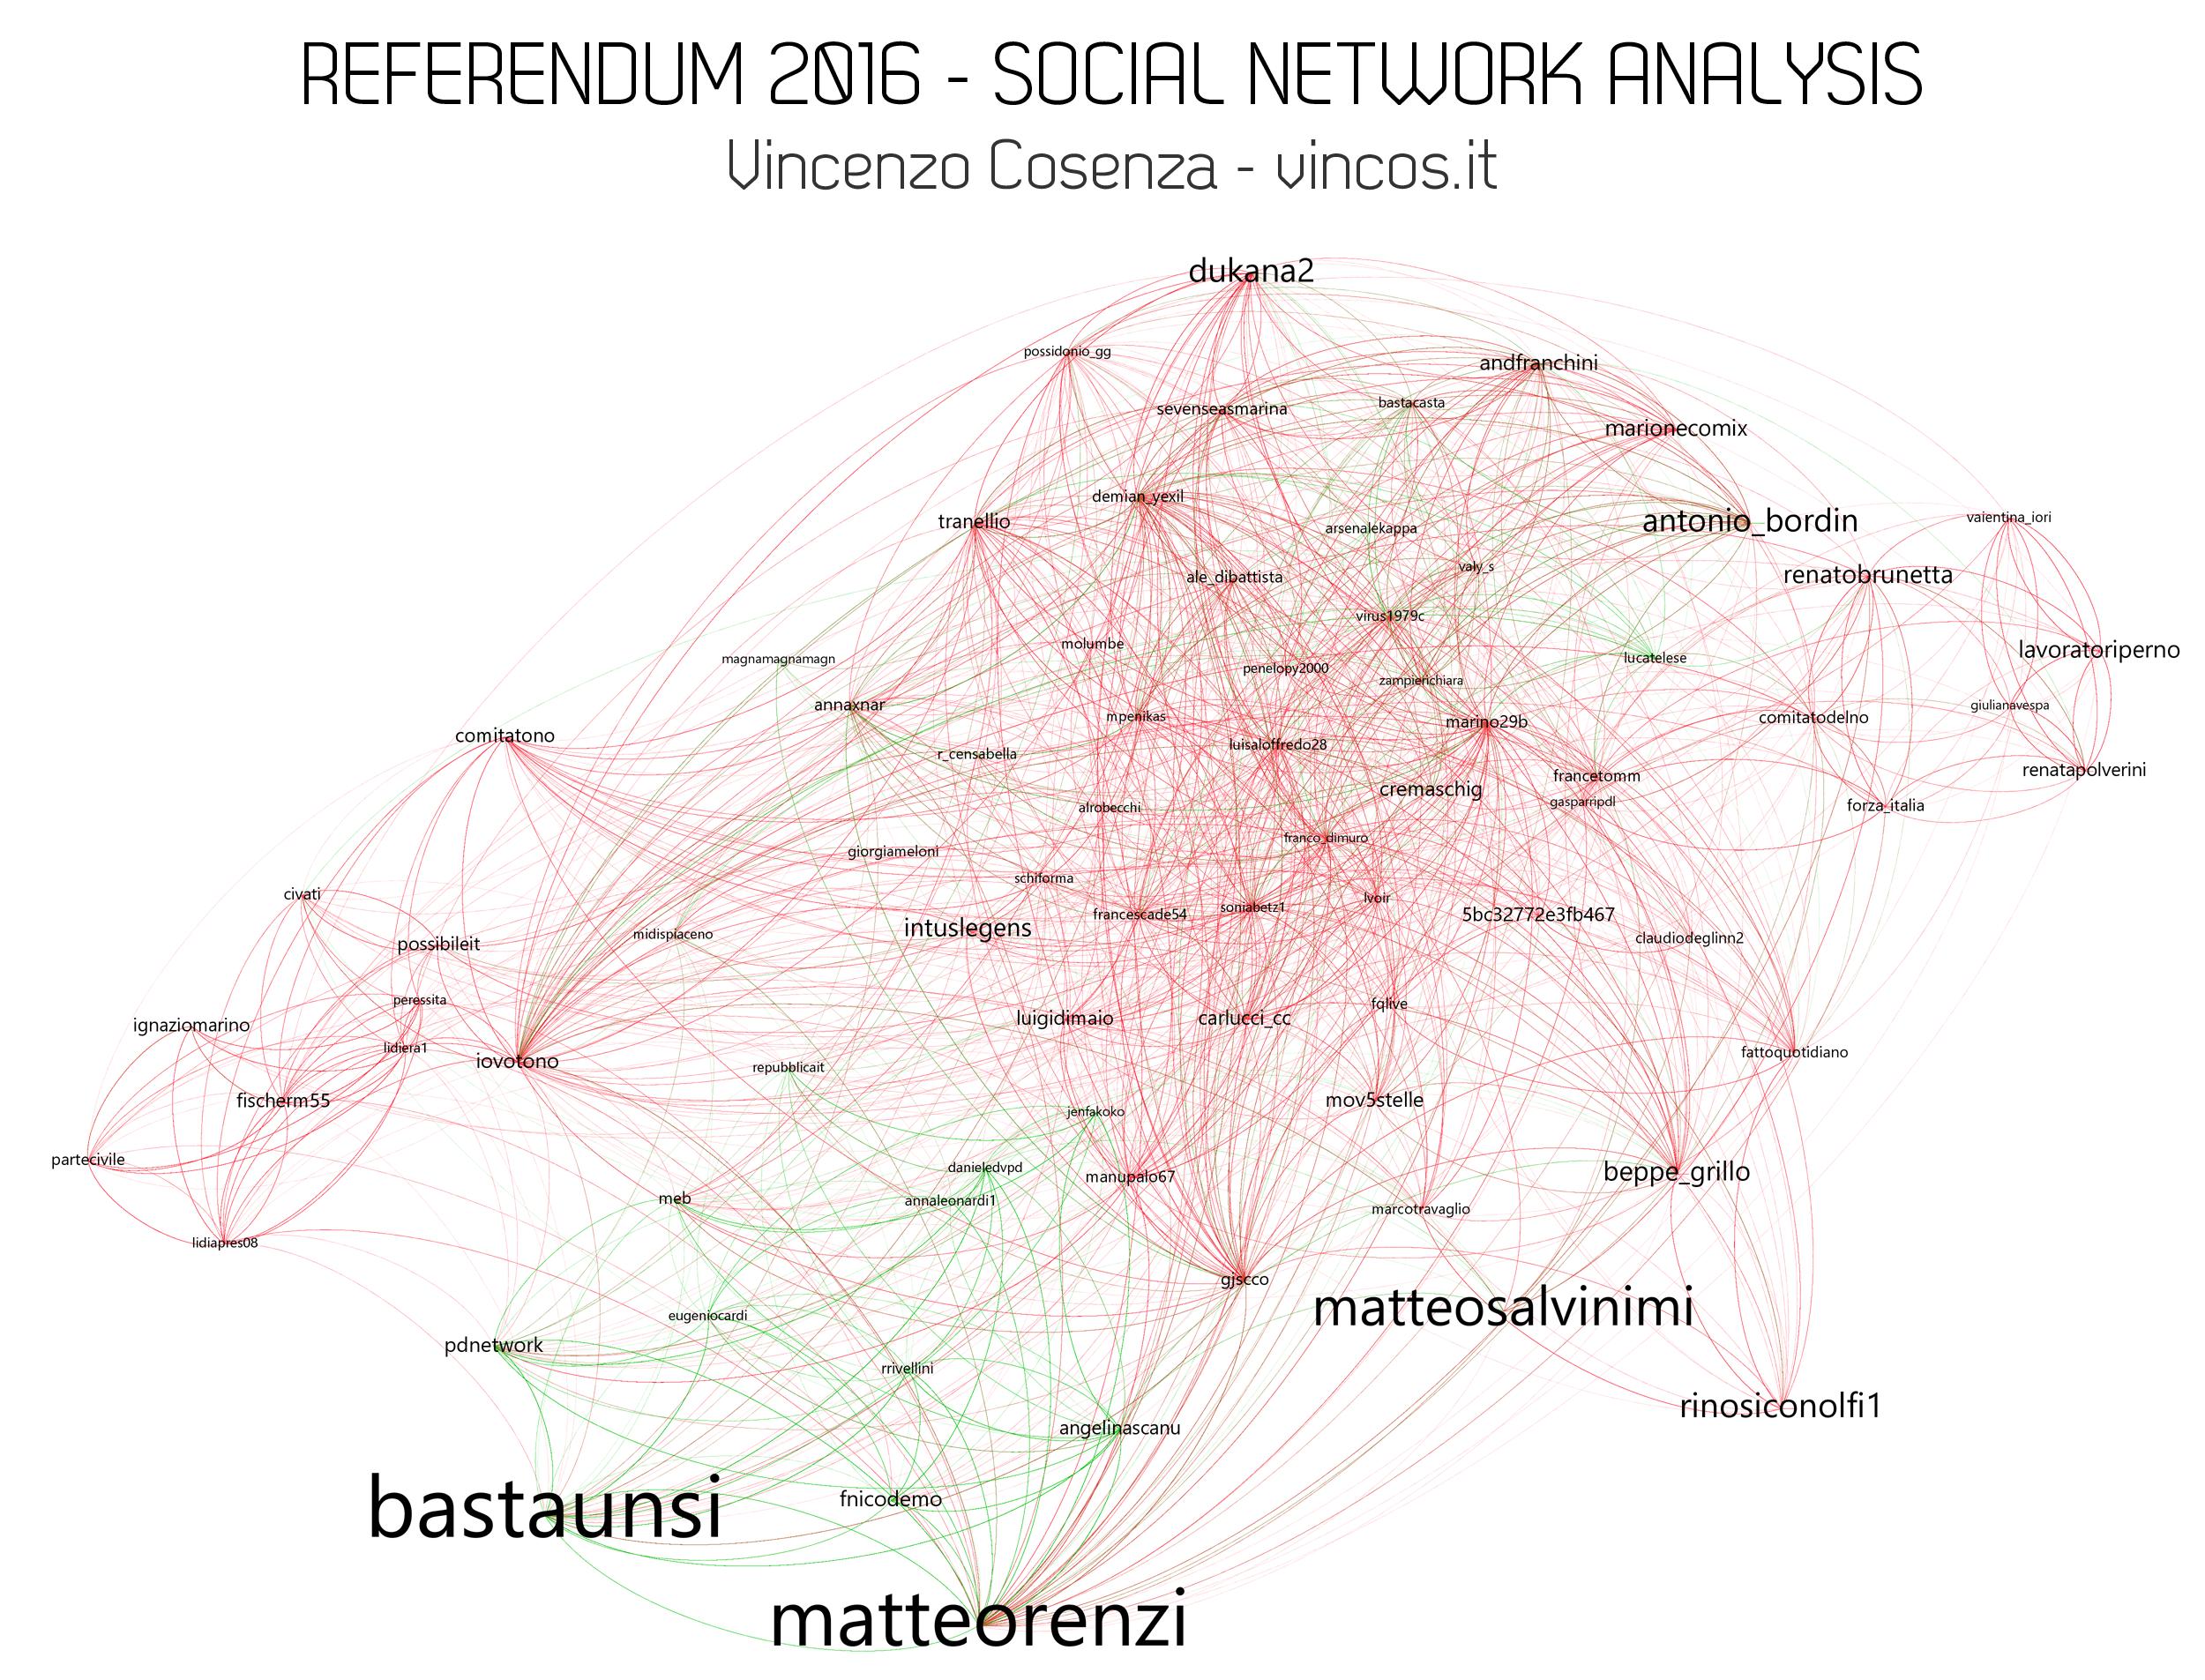 referendum 2016 social network analysis